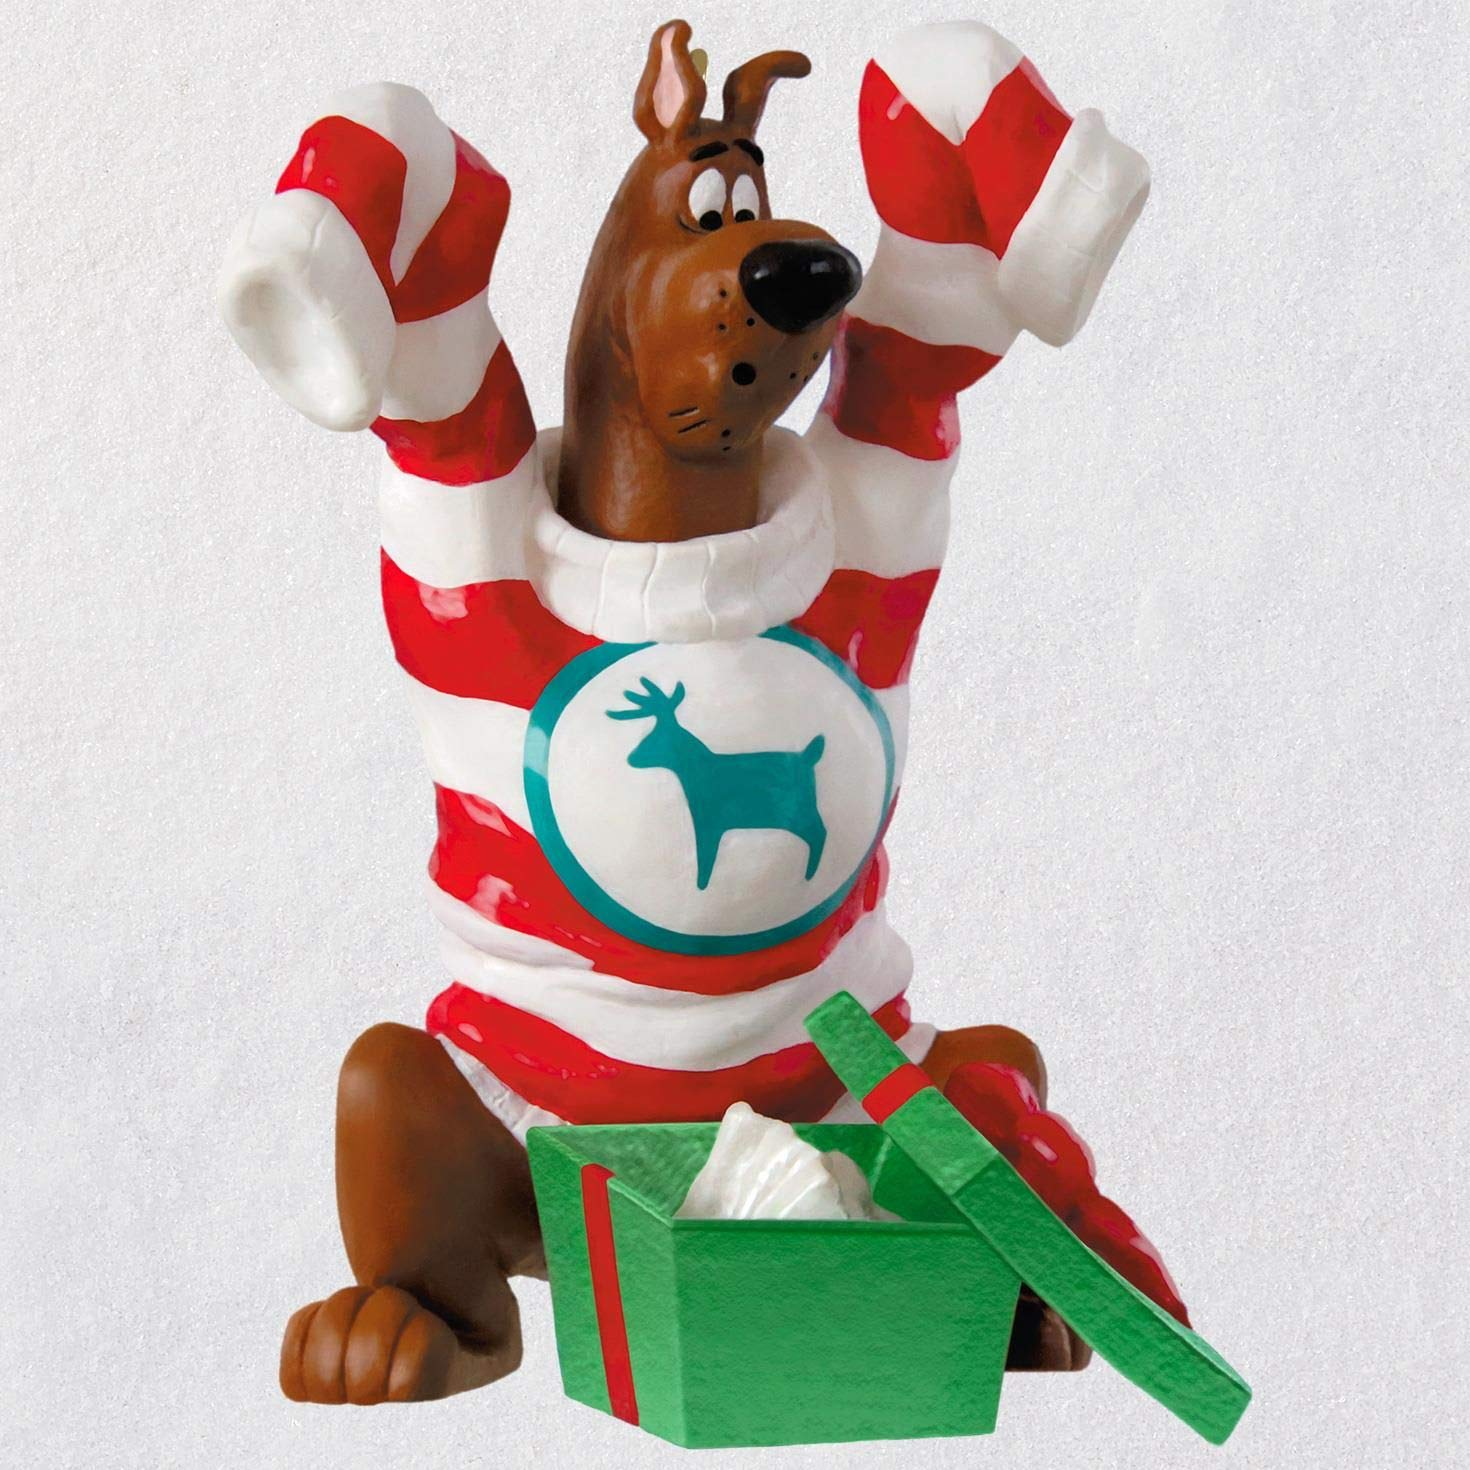 Hallmark Scooby-Doo an Oversize Surprise Ornament Movies & TV